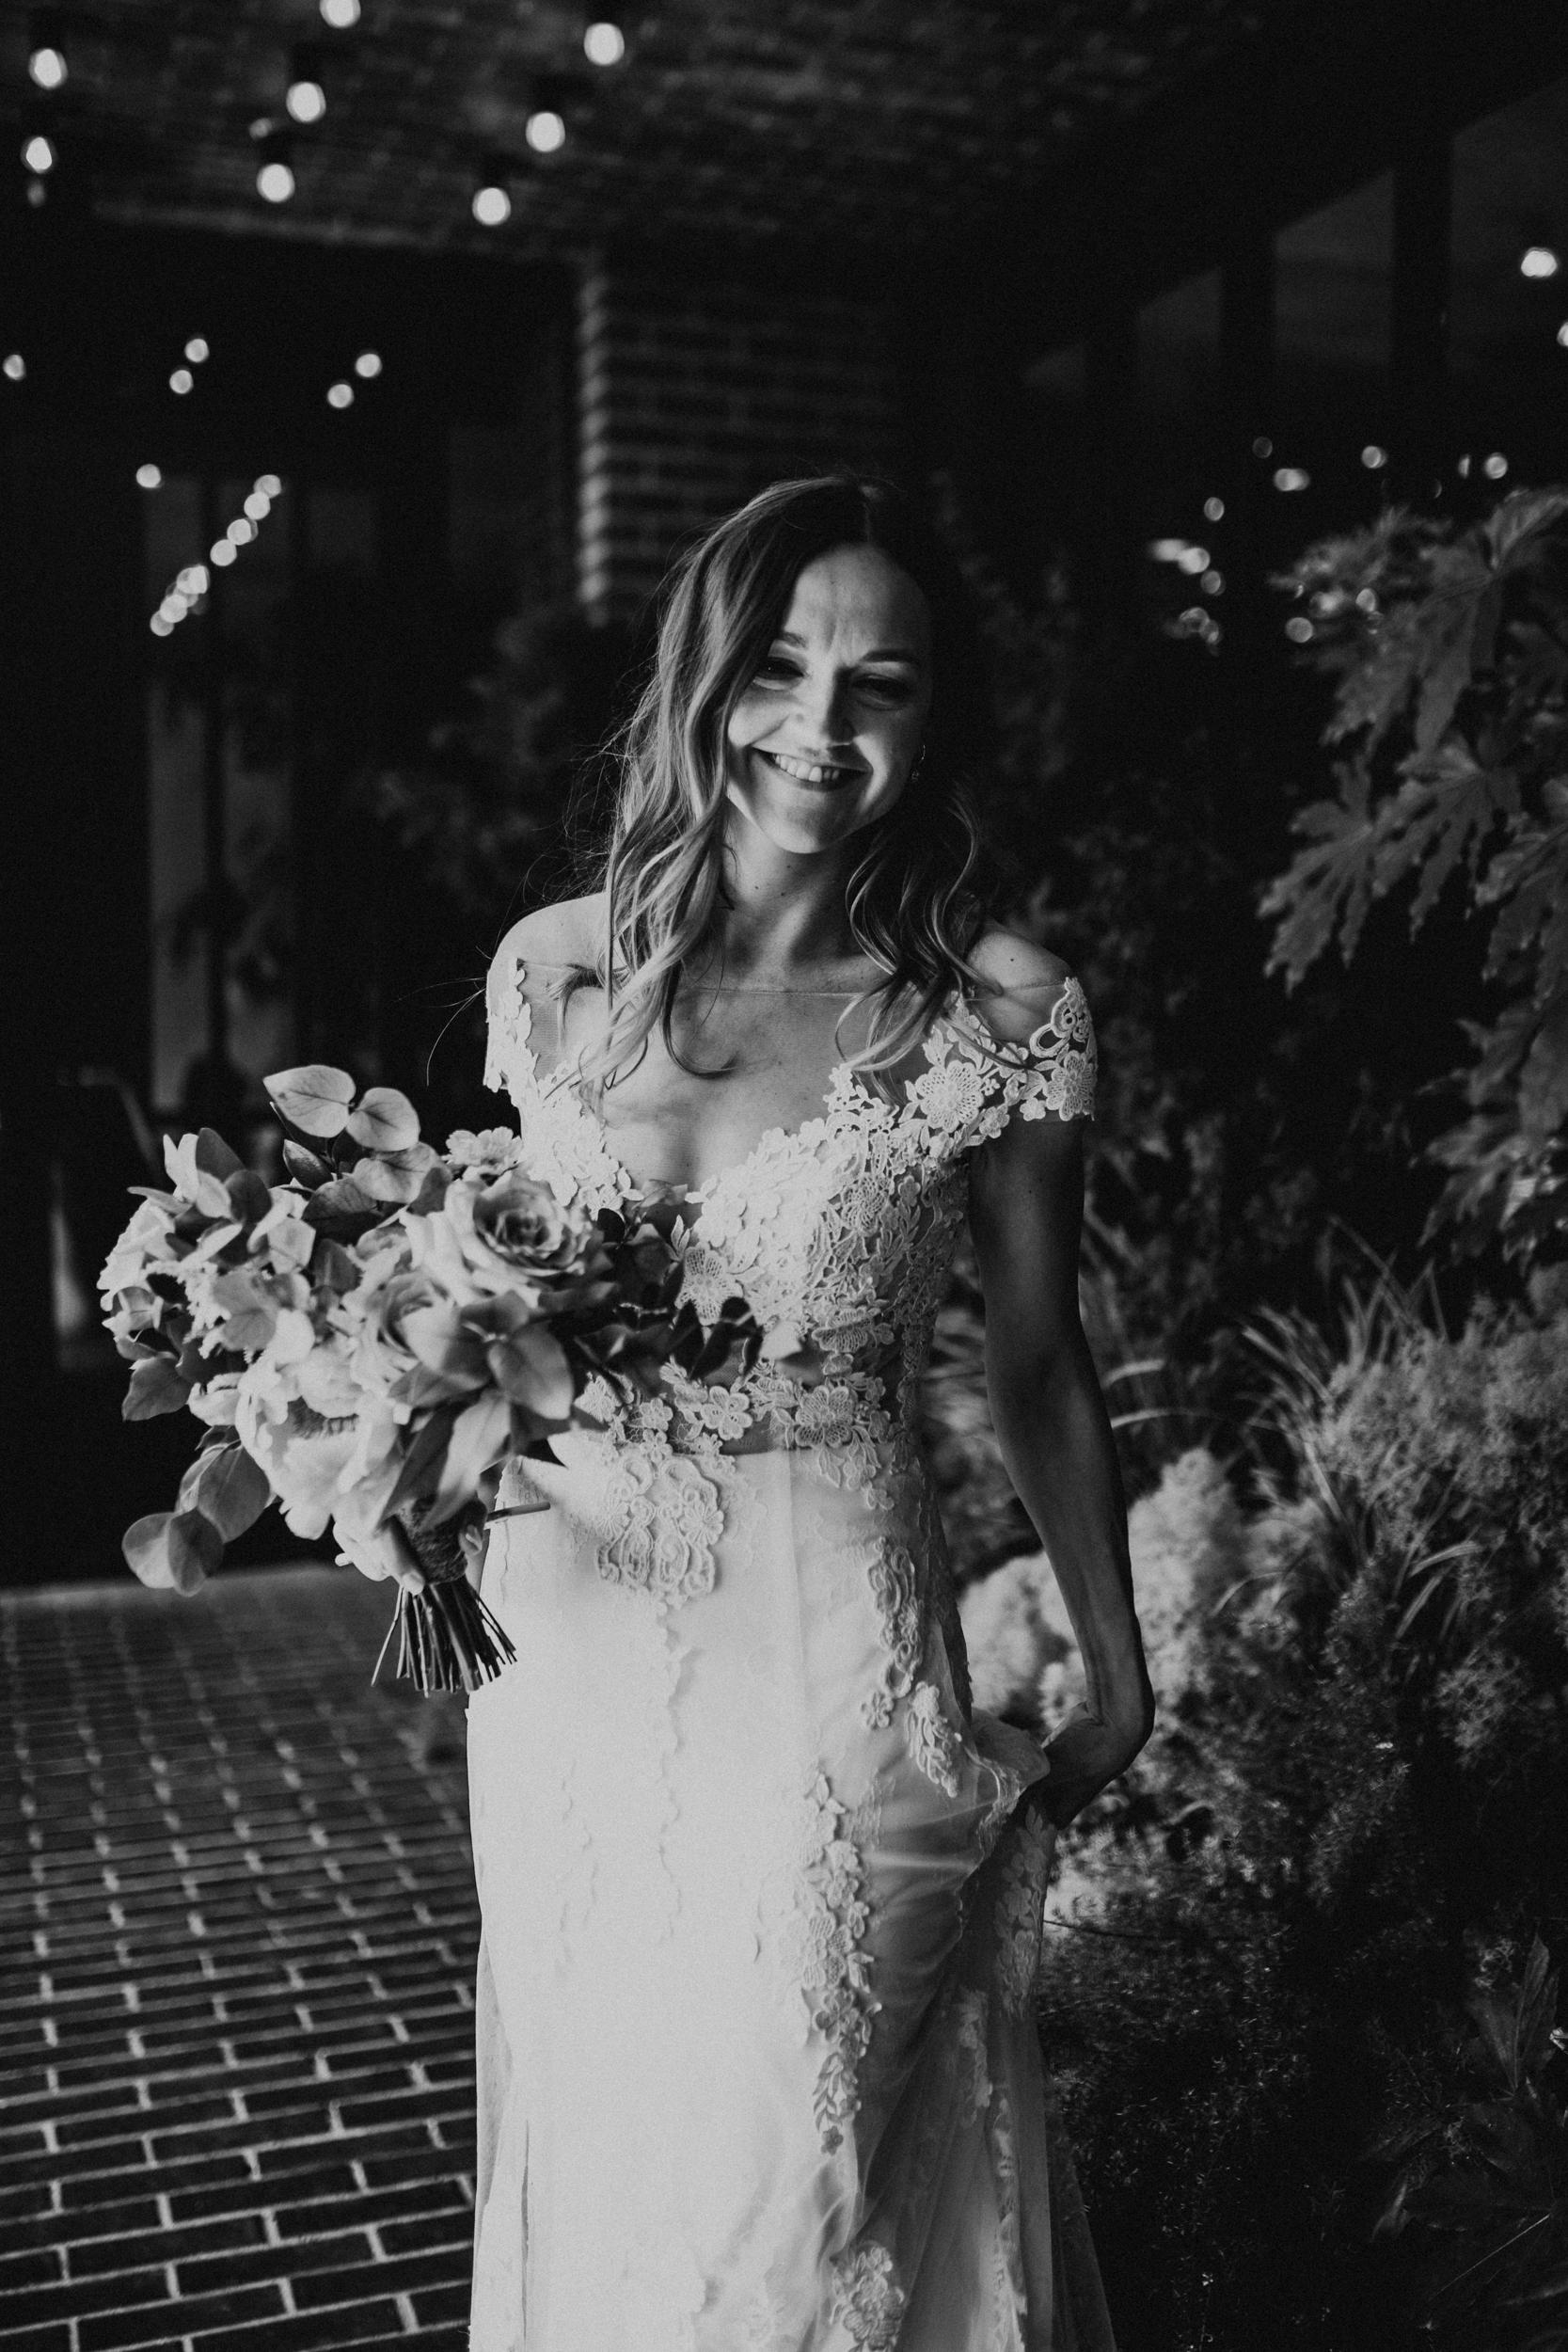 Laura-Benn-The-Asylum-London-The-Ace-Hotel-Wedding-Alternative-Darina-Stoda-Photography-111.jpg